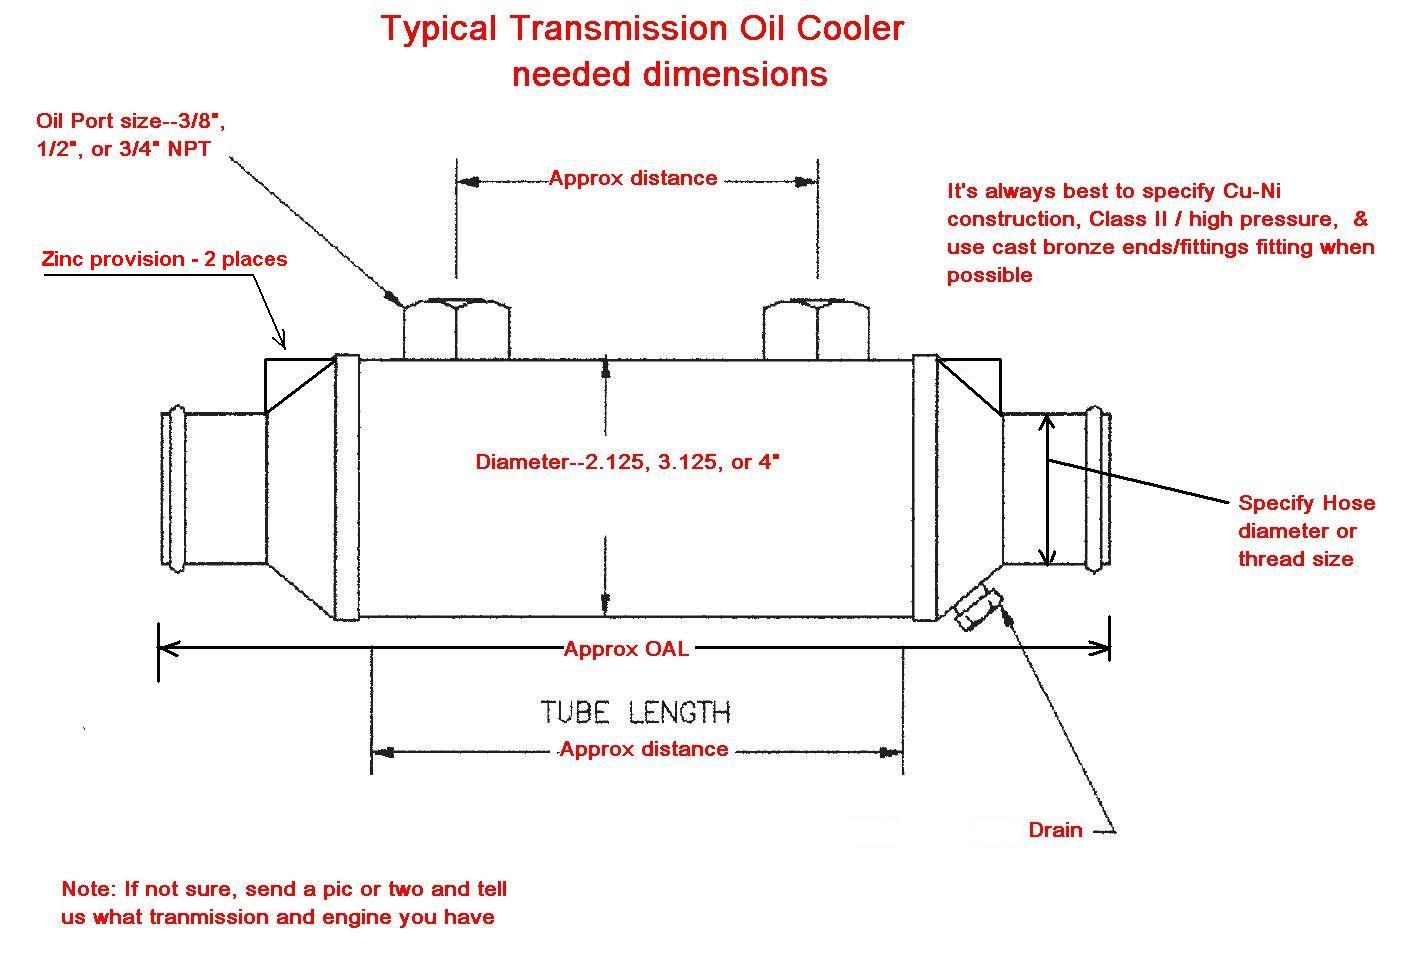 4 3 Engine Oil Cooler Diagram Start Building A Wiring Vortec Gear 6cta 8 400 420 430 450 S Diamonds Swac 480 Rh Sbmar Com Parts Chevy 43